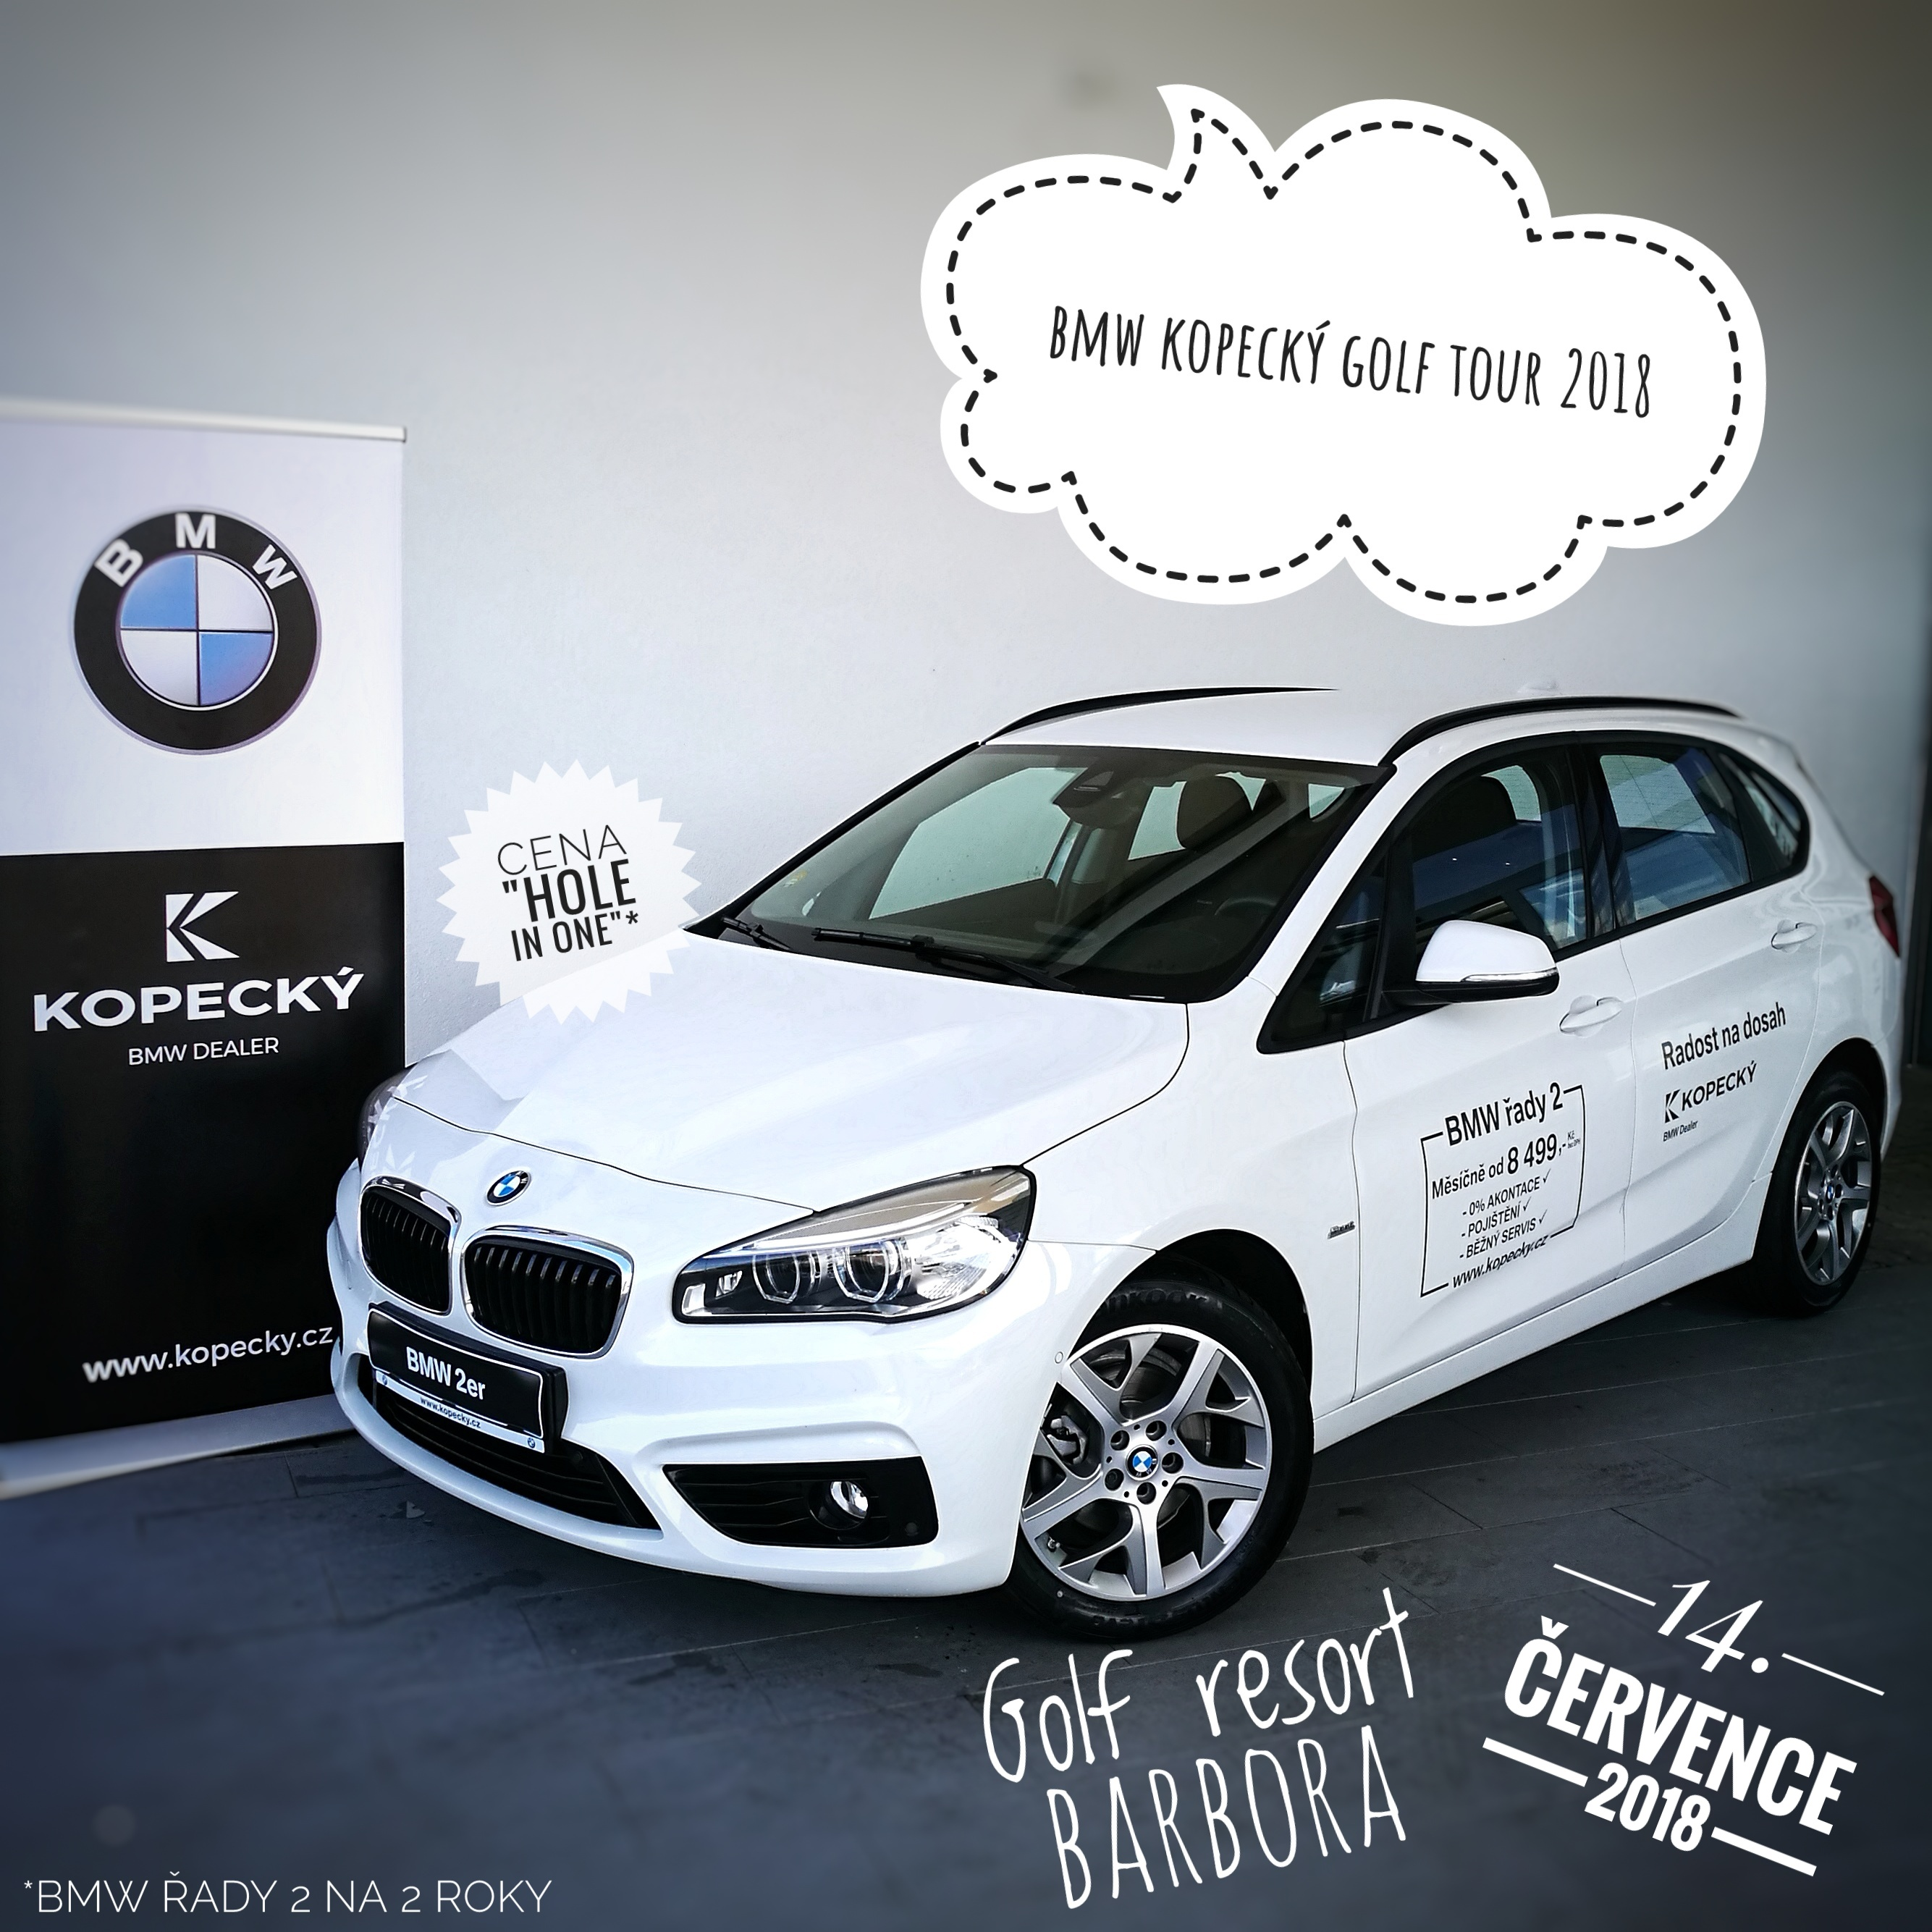 BMW KOPECKÝ GOLF TOUR 2018 startovné 990 Kč, FEE 0 Kč - hrajeme o vůz BMW !!!